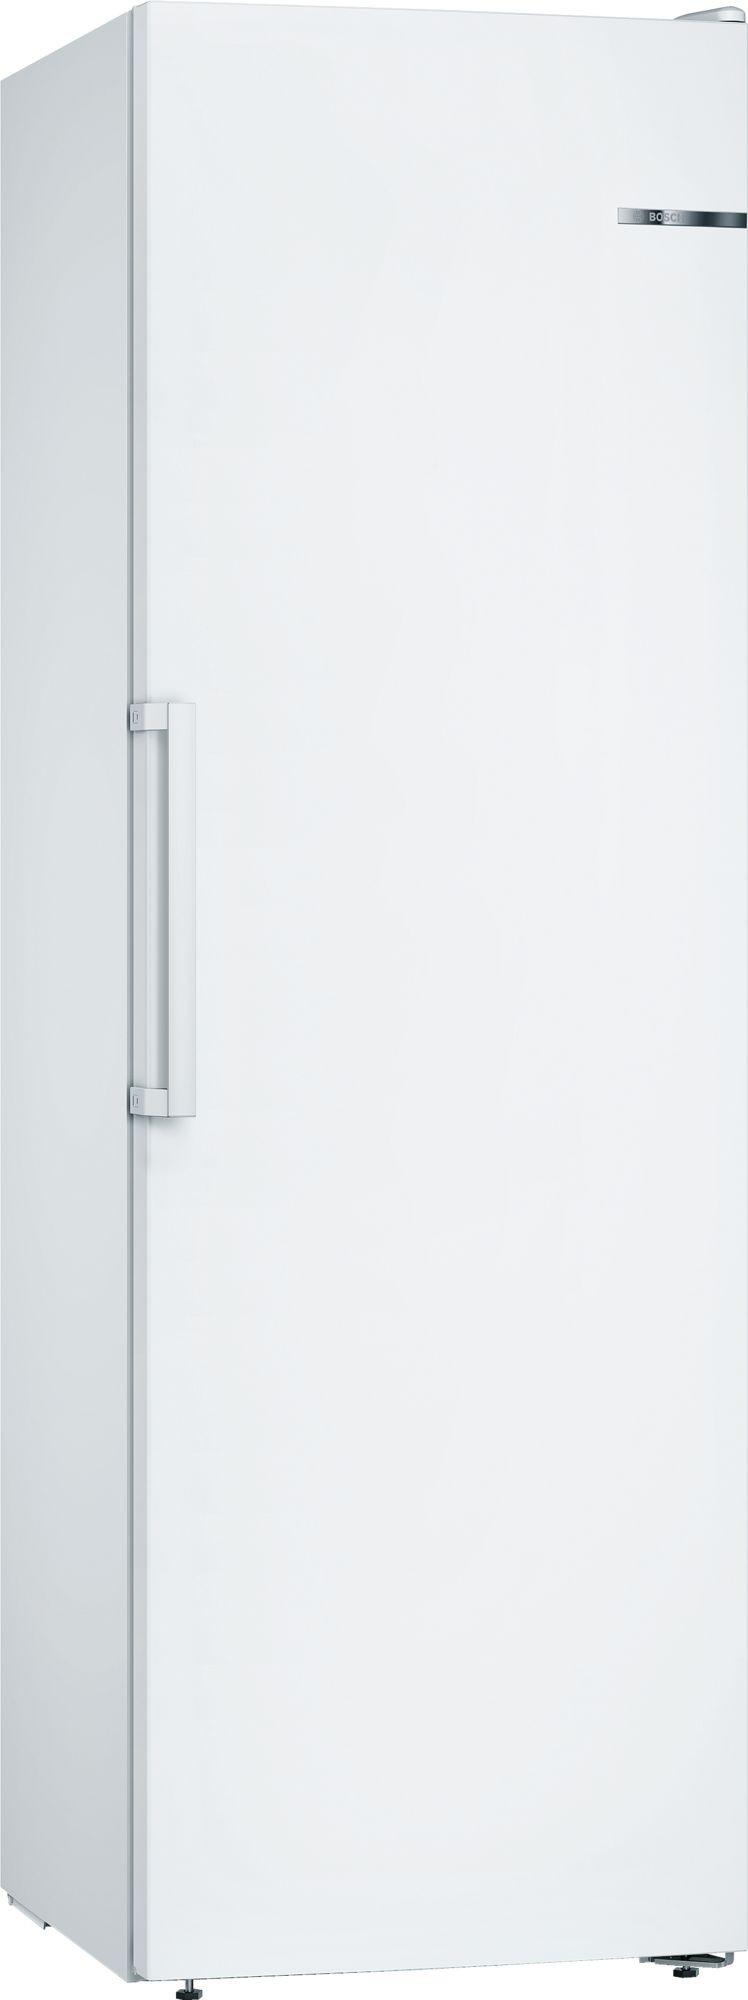 Bosch Serie 4 GSN36VW3VG No Frost Freestanding White Upright Freezer